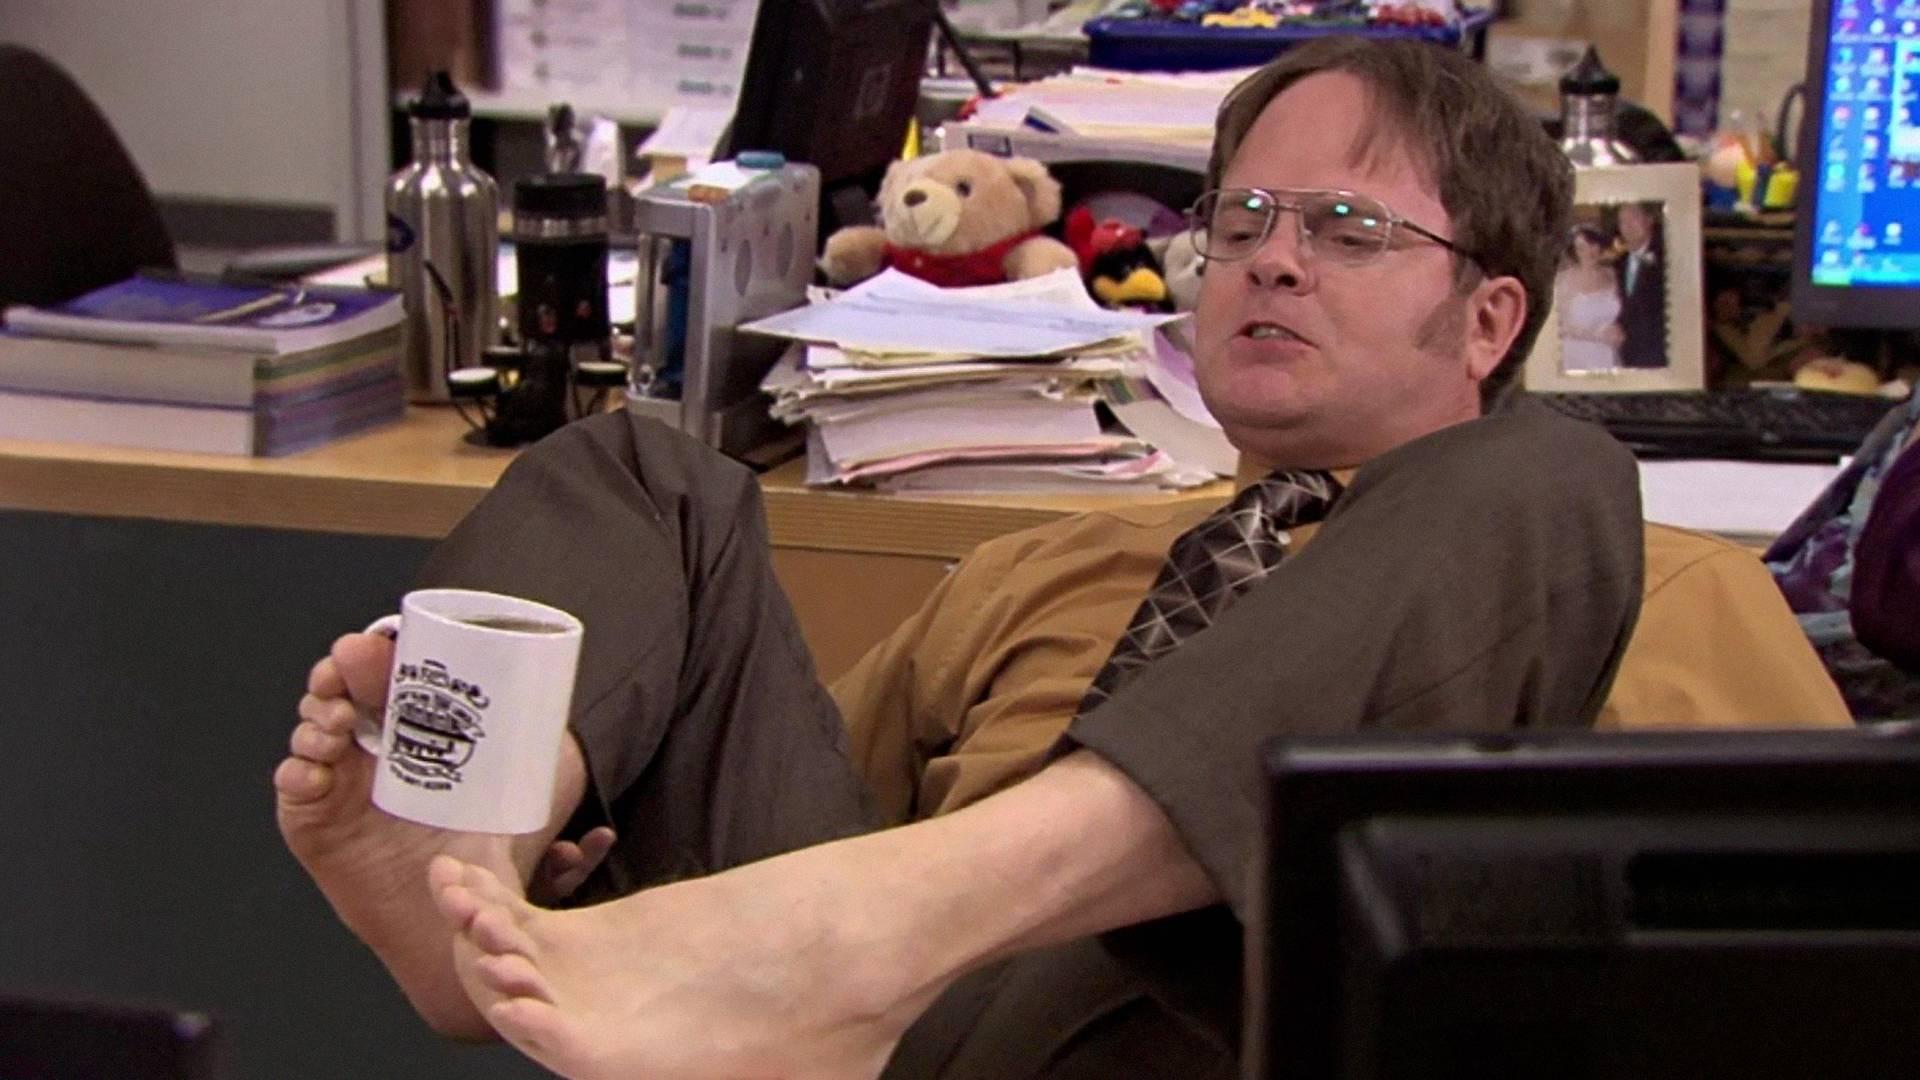 The Office Season 7 Episode 10